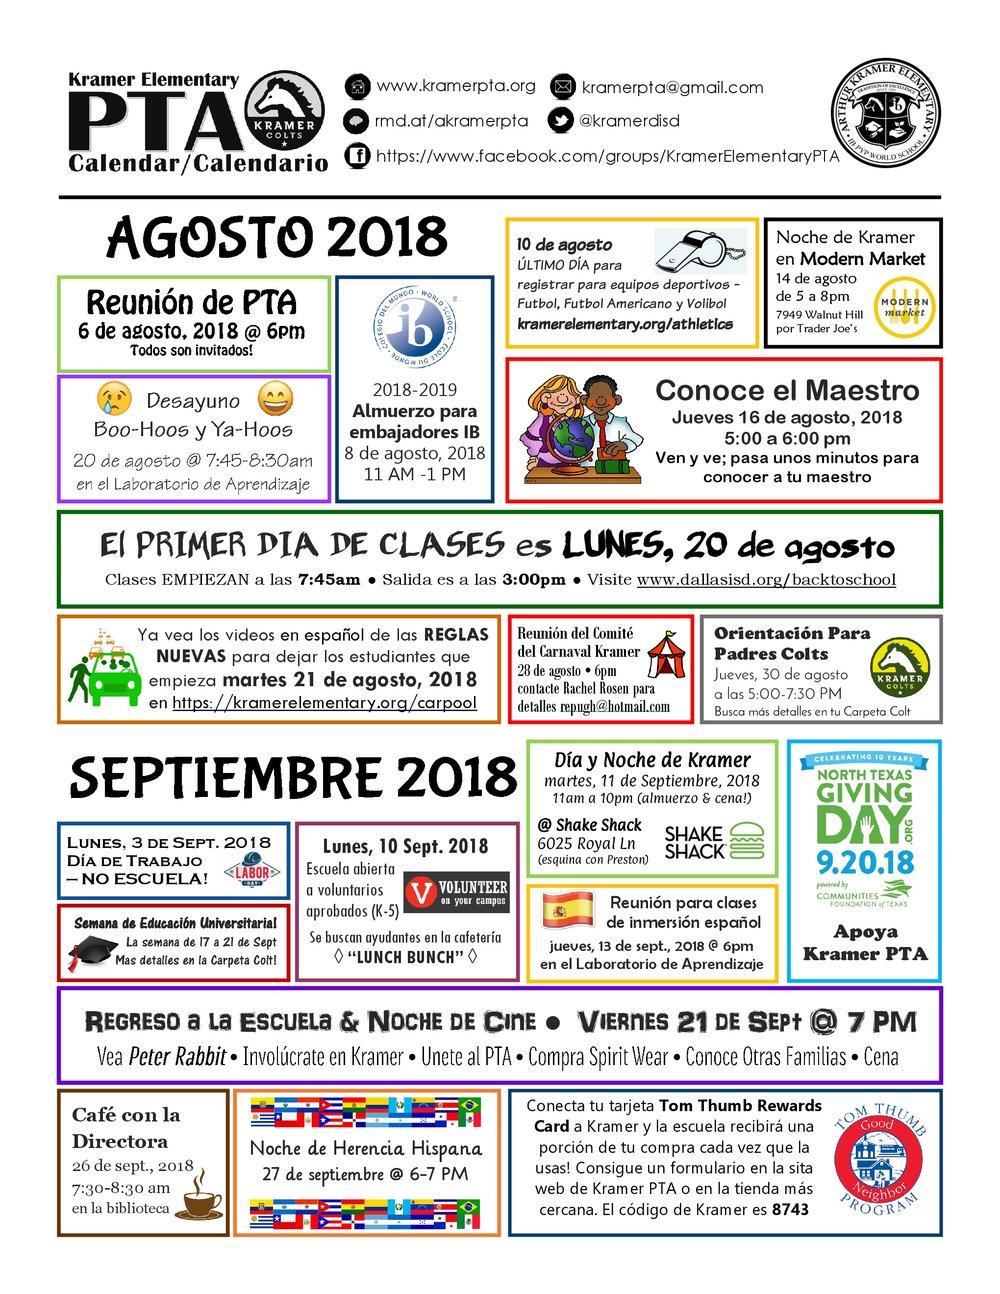 August calendar-spanish.jpg